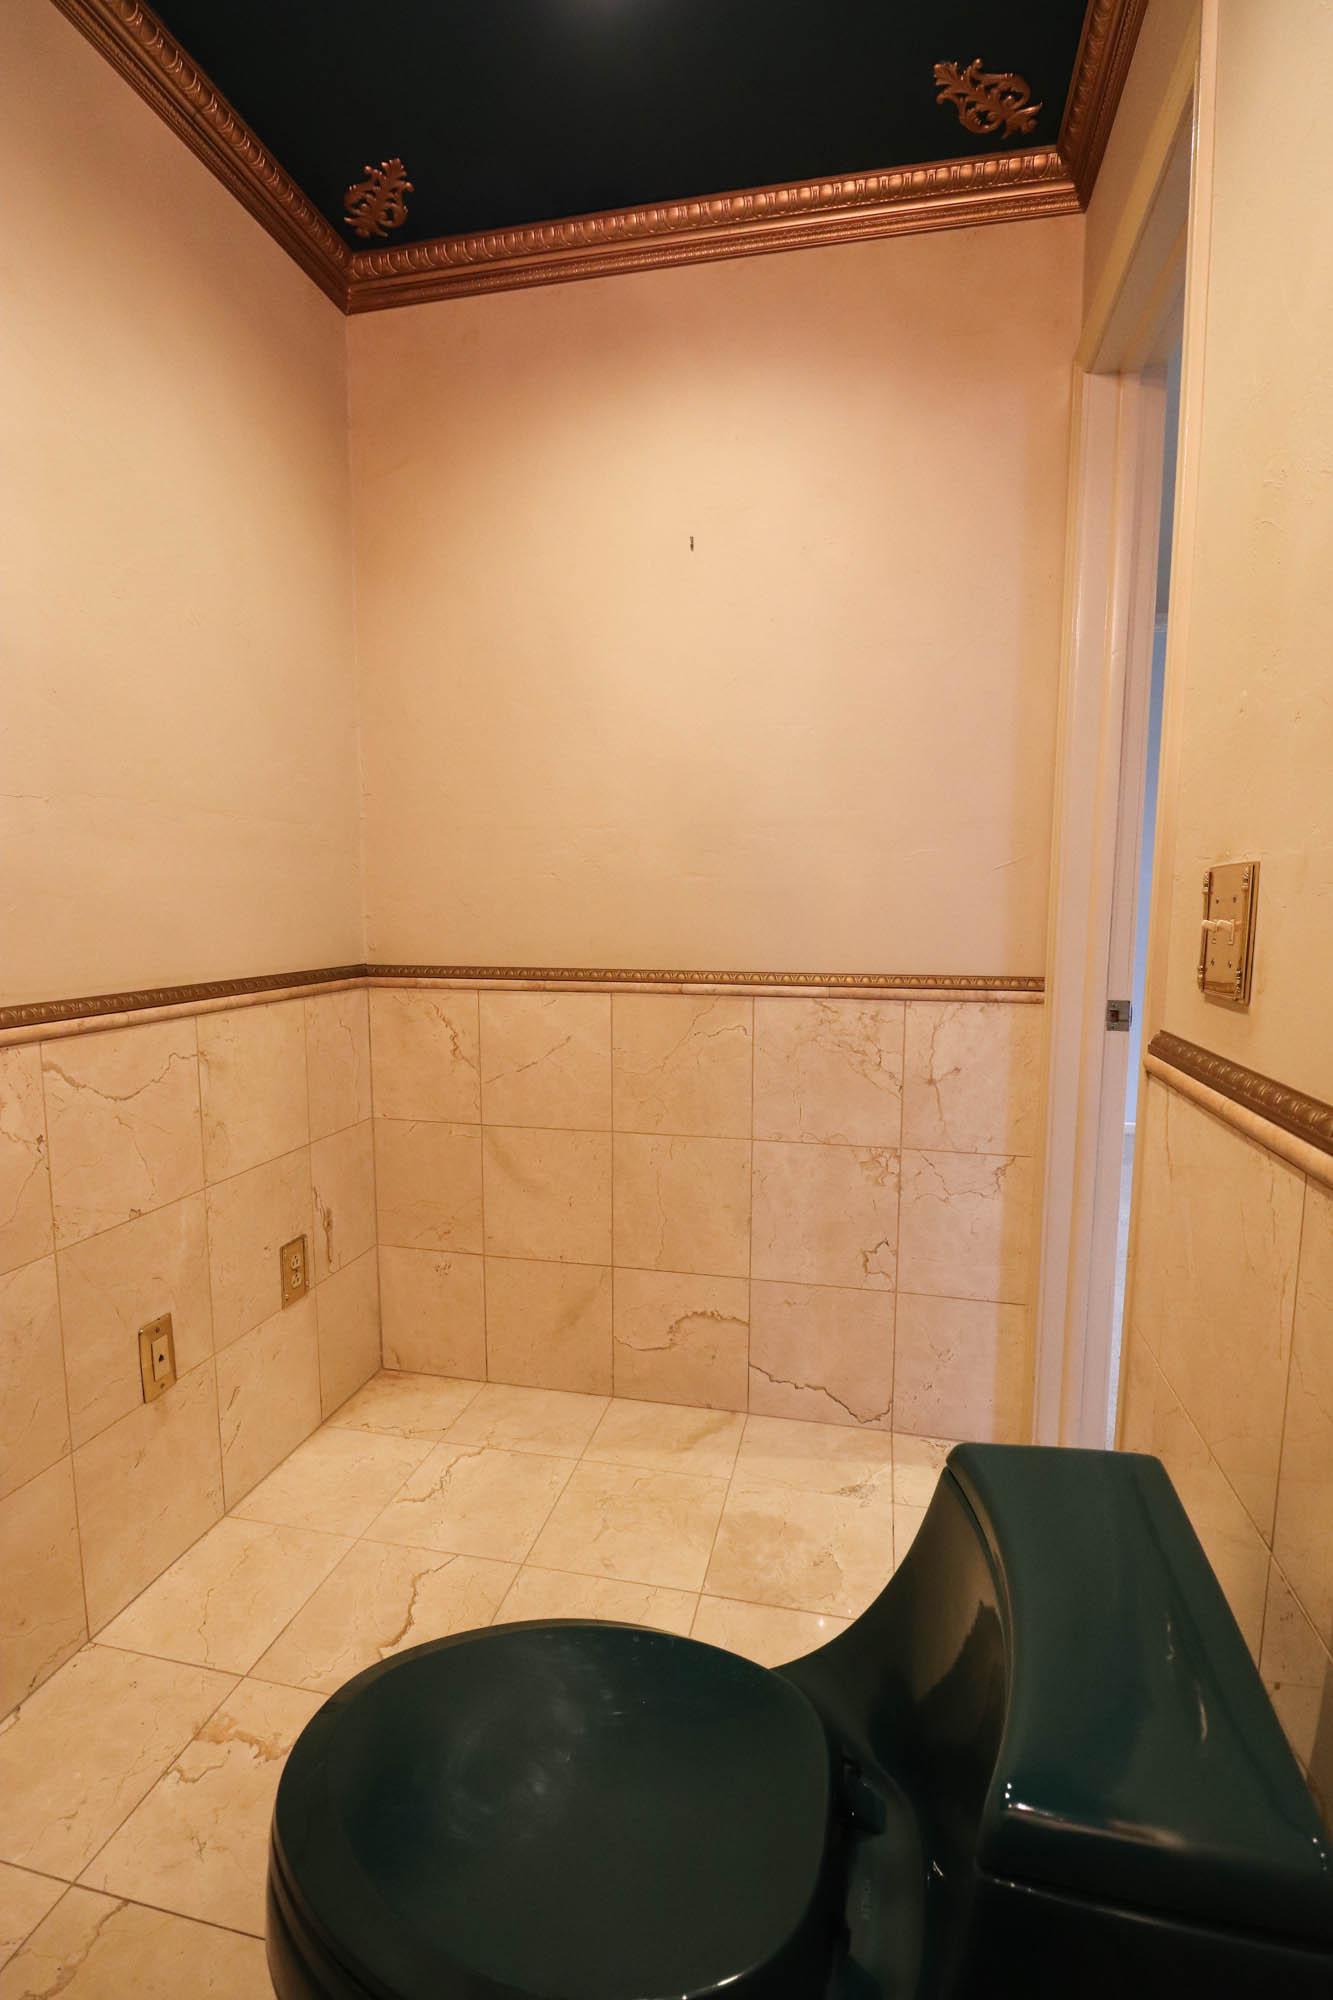 1990s bathroom